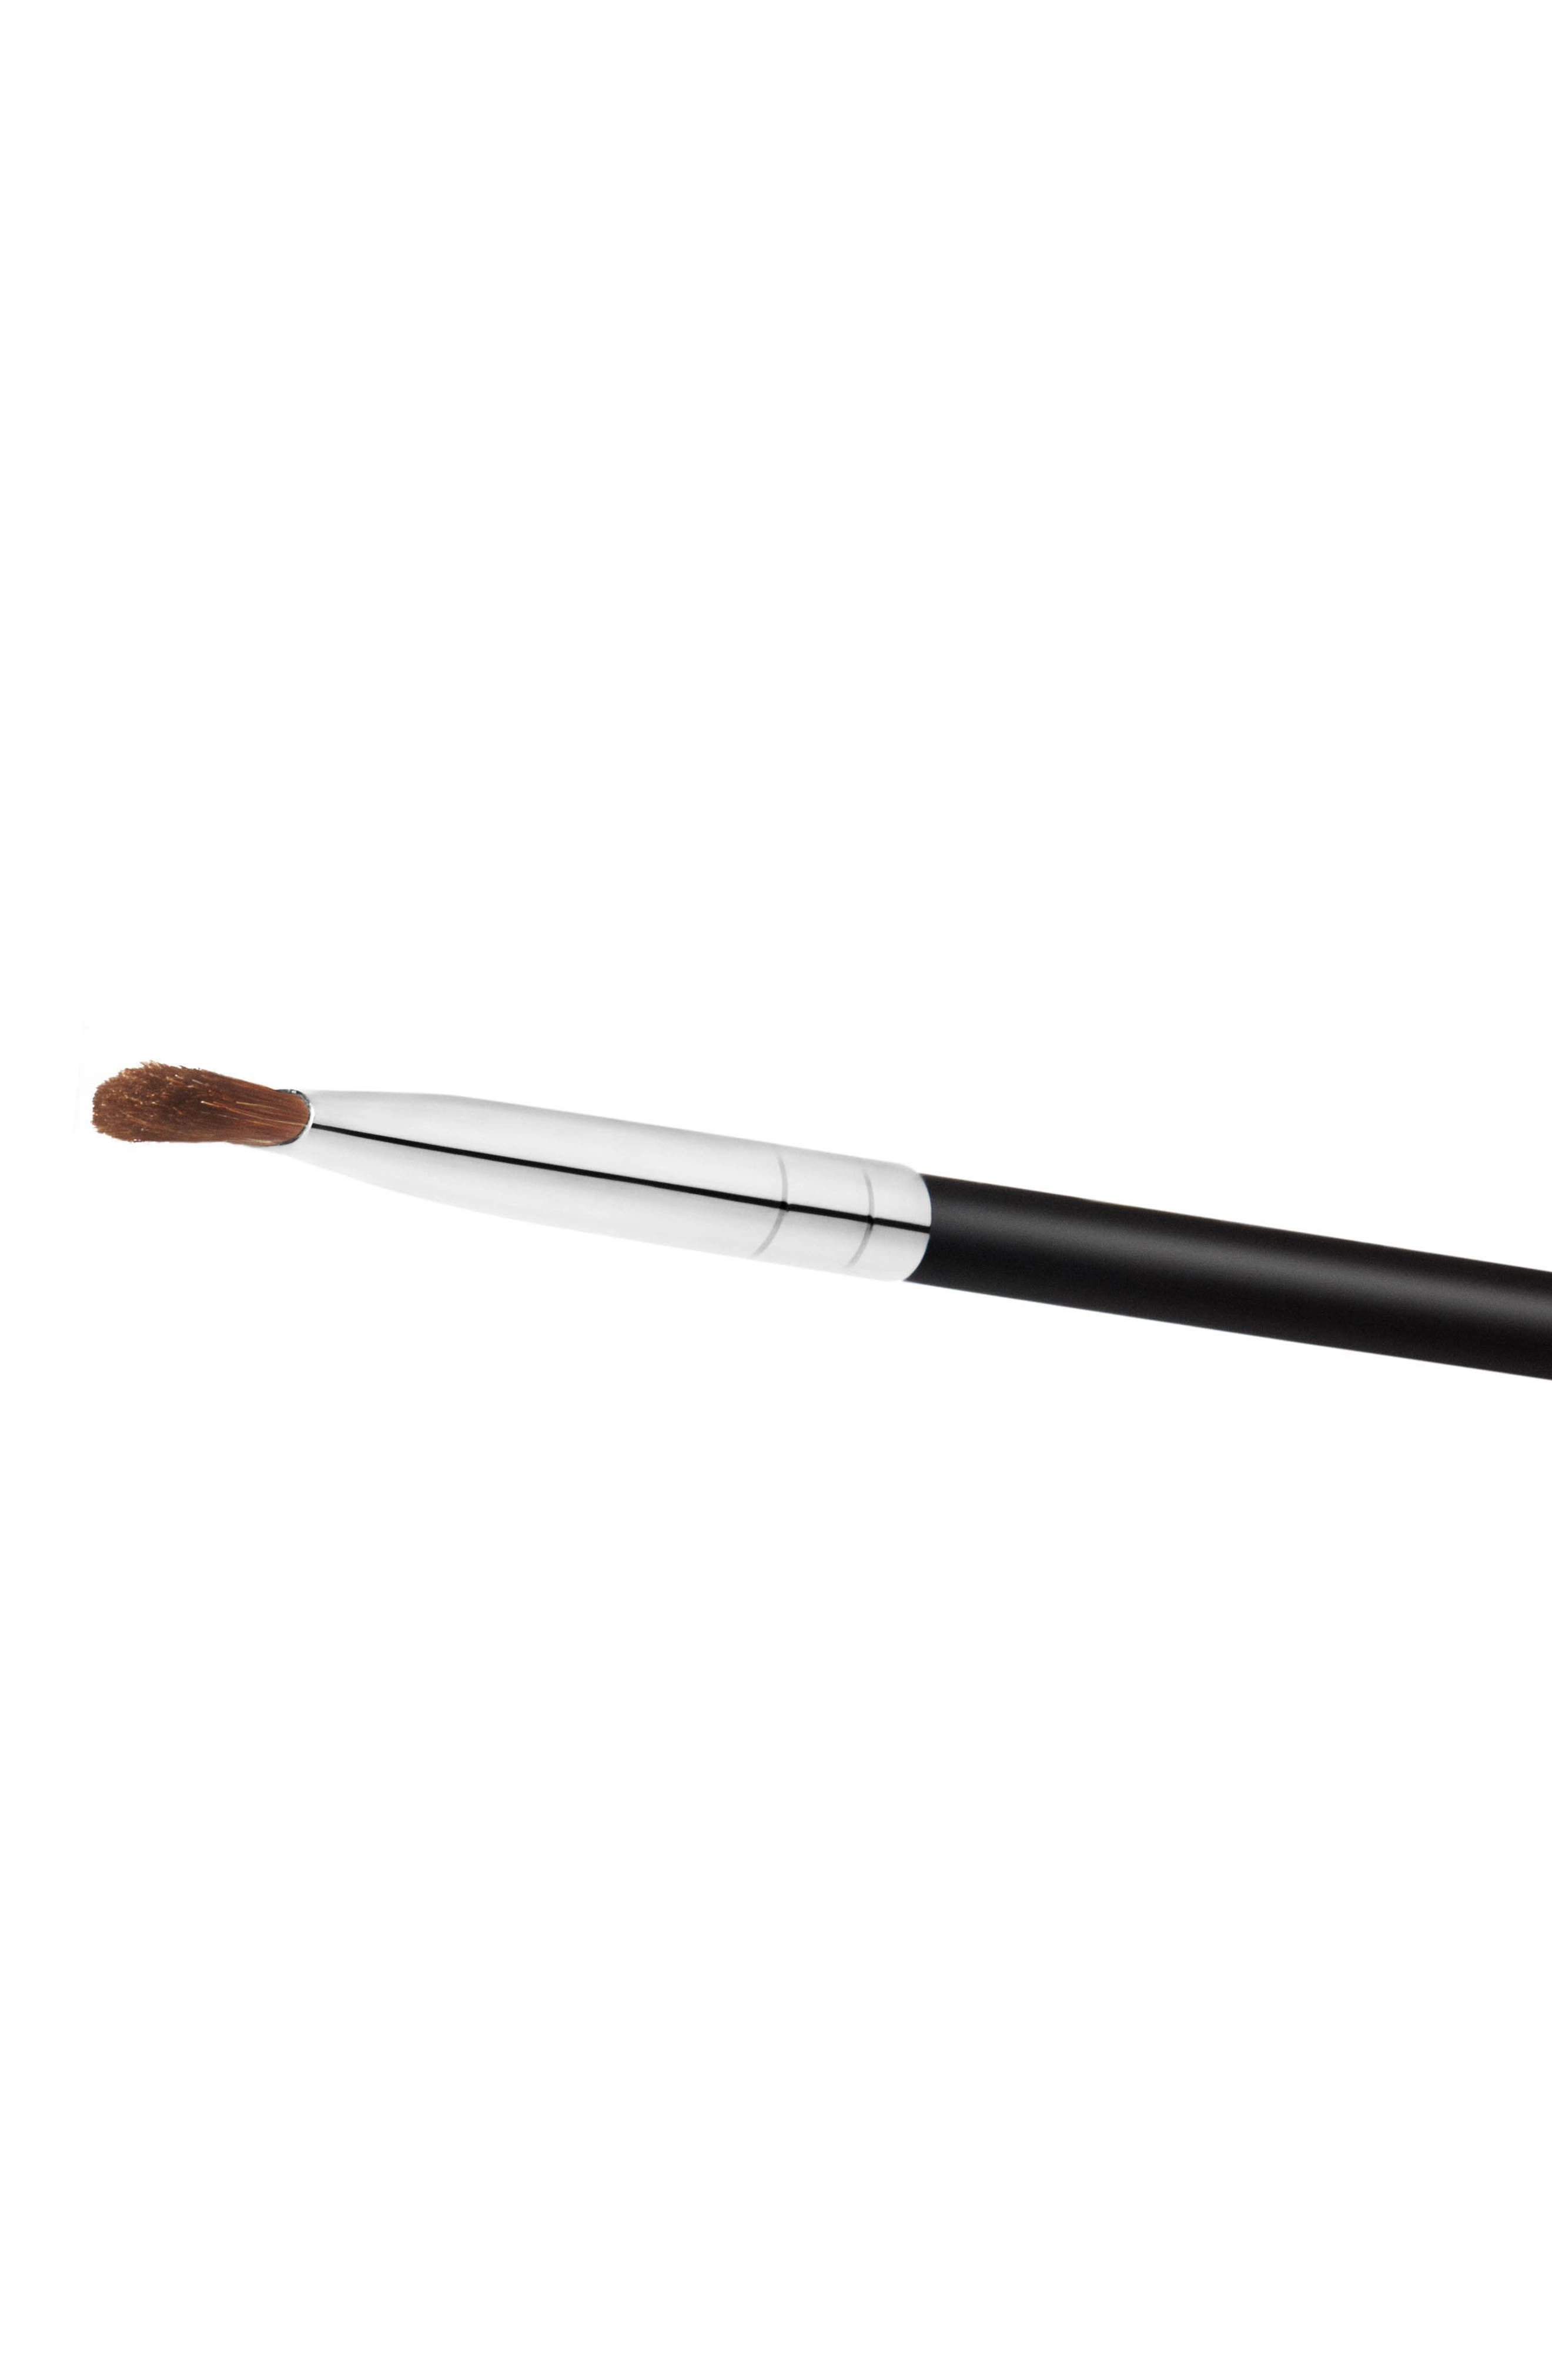 ,                             MAC 228 Synthetic Mini Shader Brush,                             Alternate thumbnail 2, color,                             NO COLOR